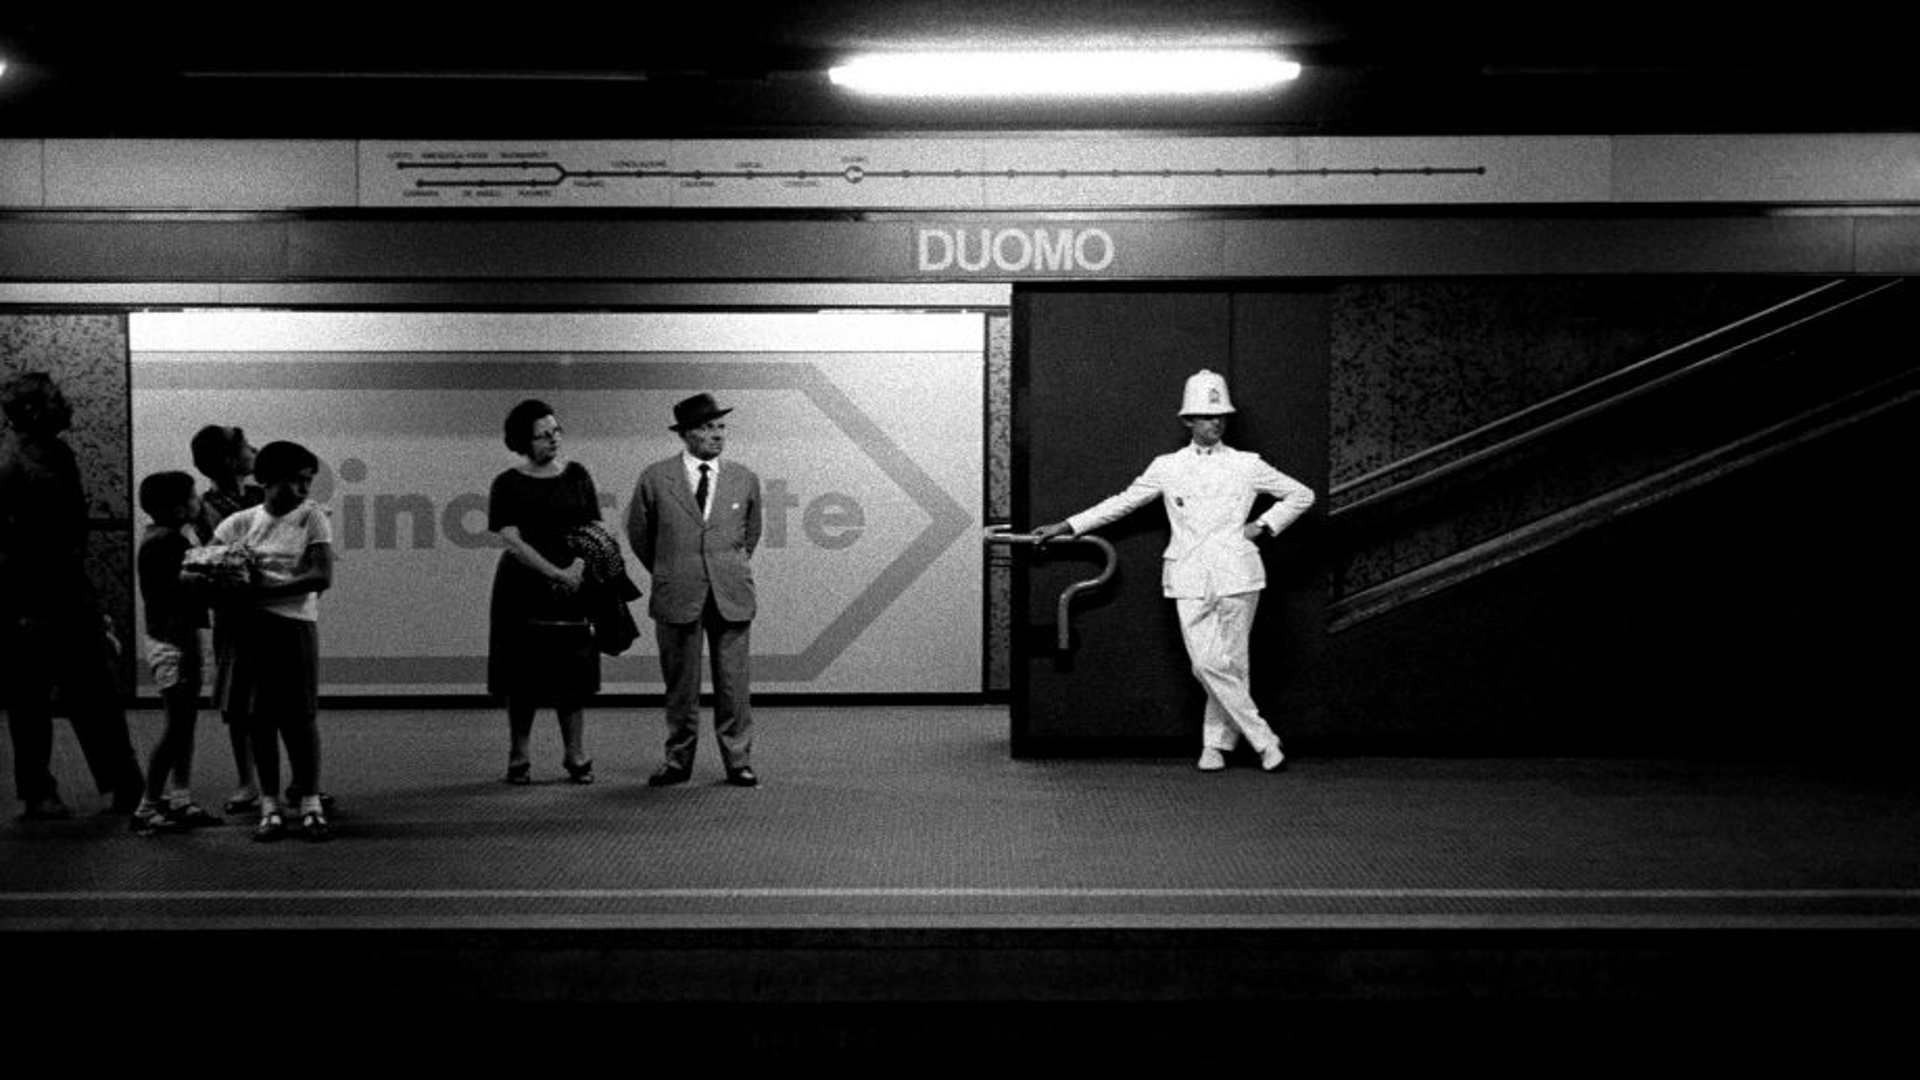 Les sixties à Milan